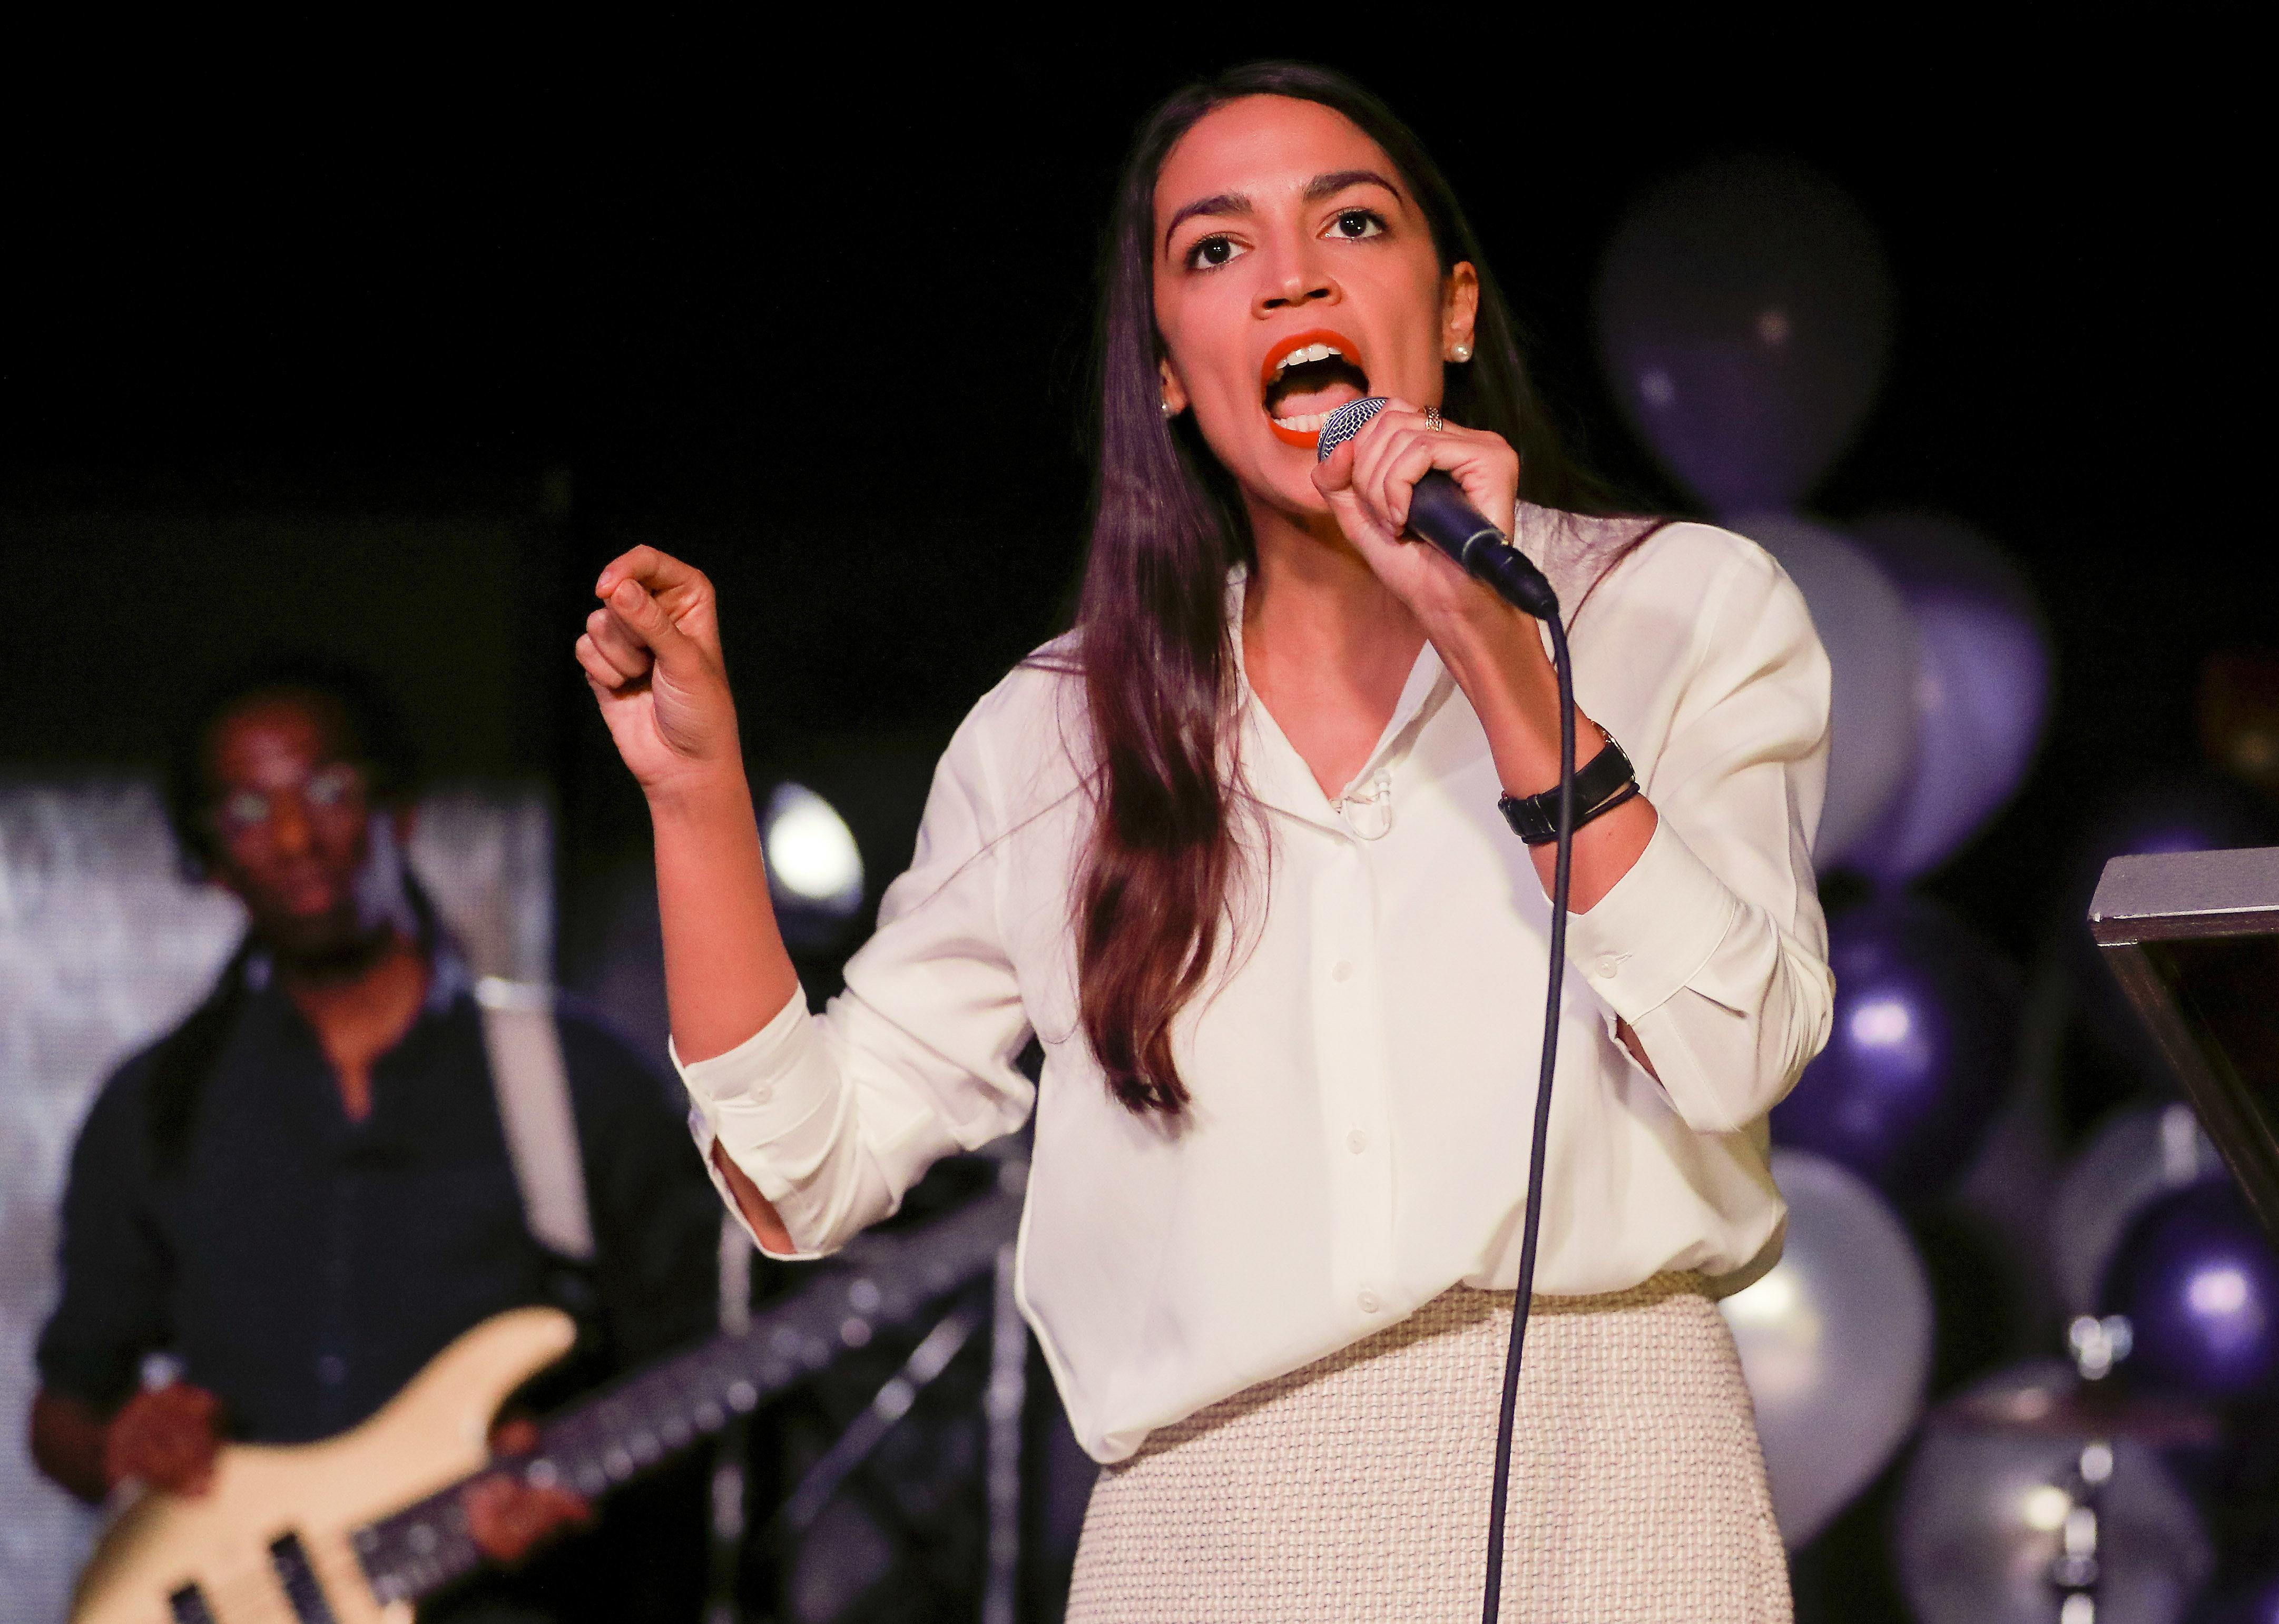 Alexandria Ocasio-Cortez Takes Steve King Gaffe, Fires It Right Back At GOP Critics